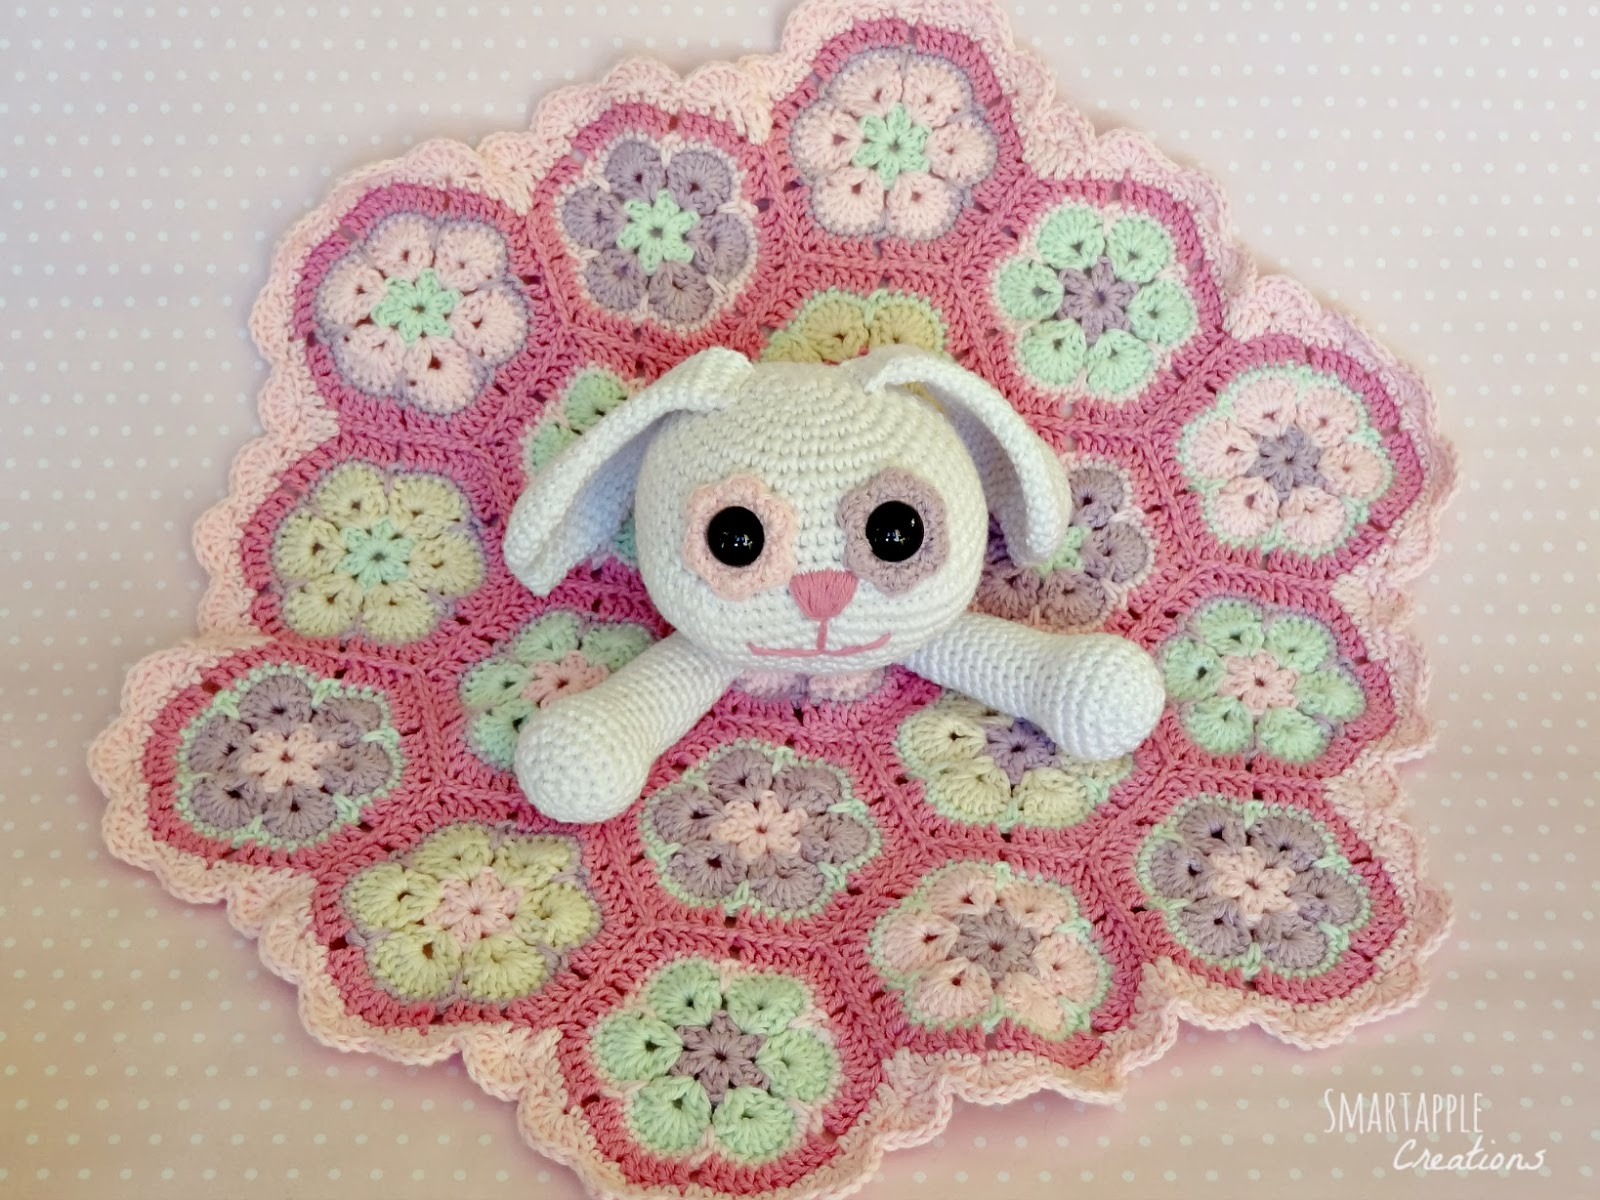 African Flower Amigurumi Free : Smartapple Creations - amigurumi and crochet: Crochet ...